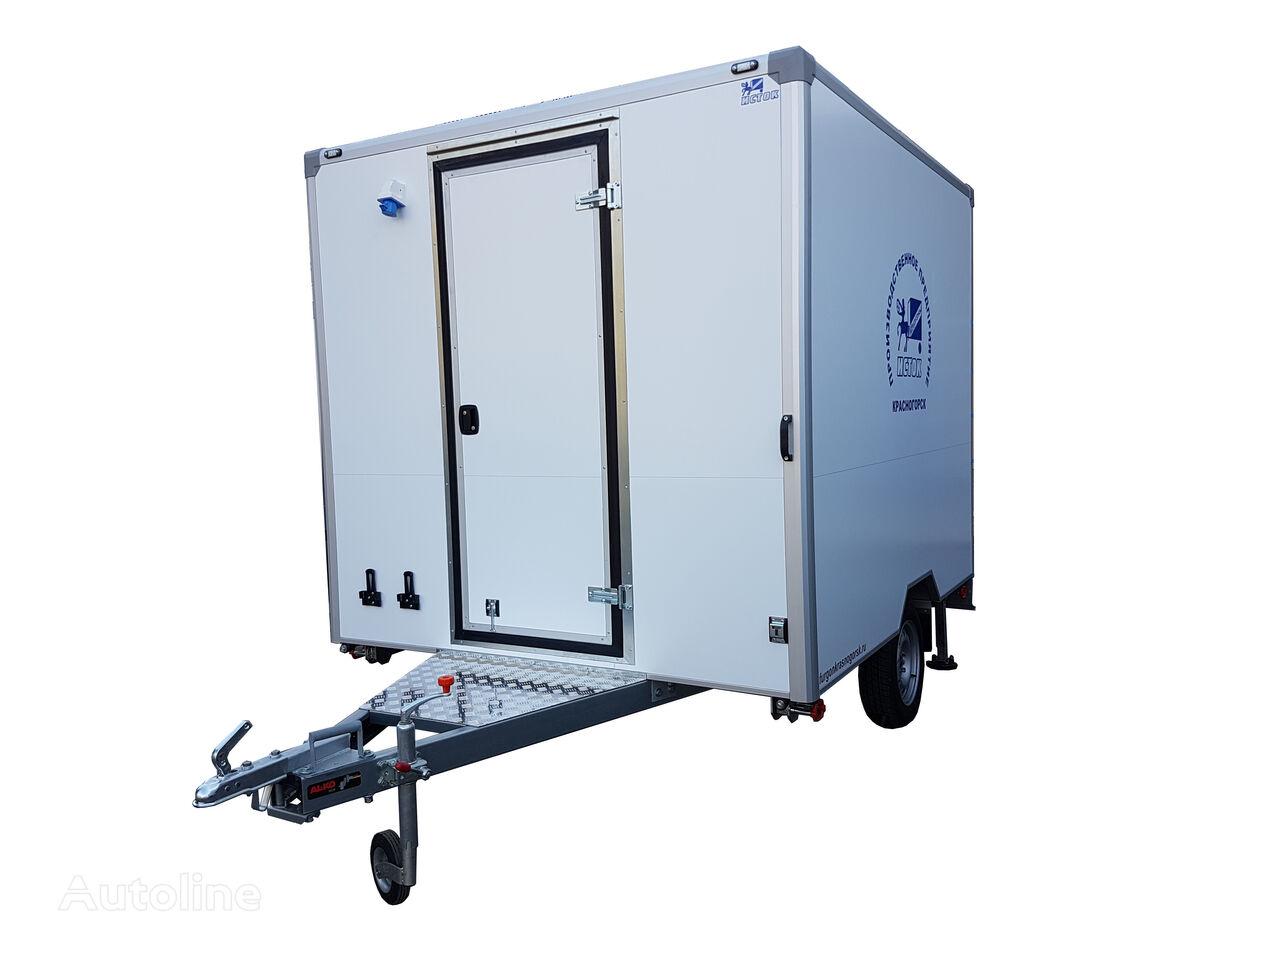 new ISTOK 3791A2 vending trailer